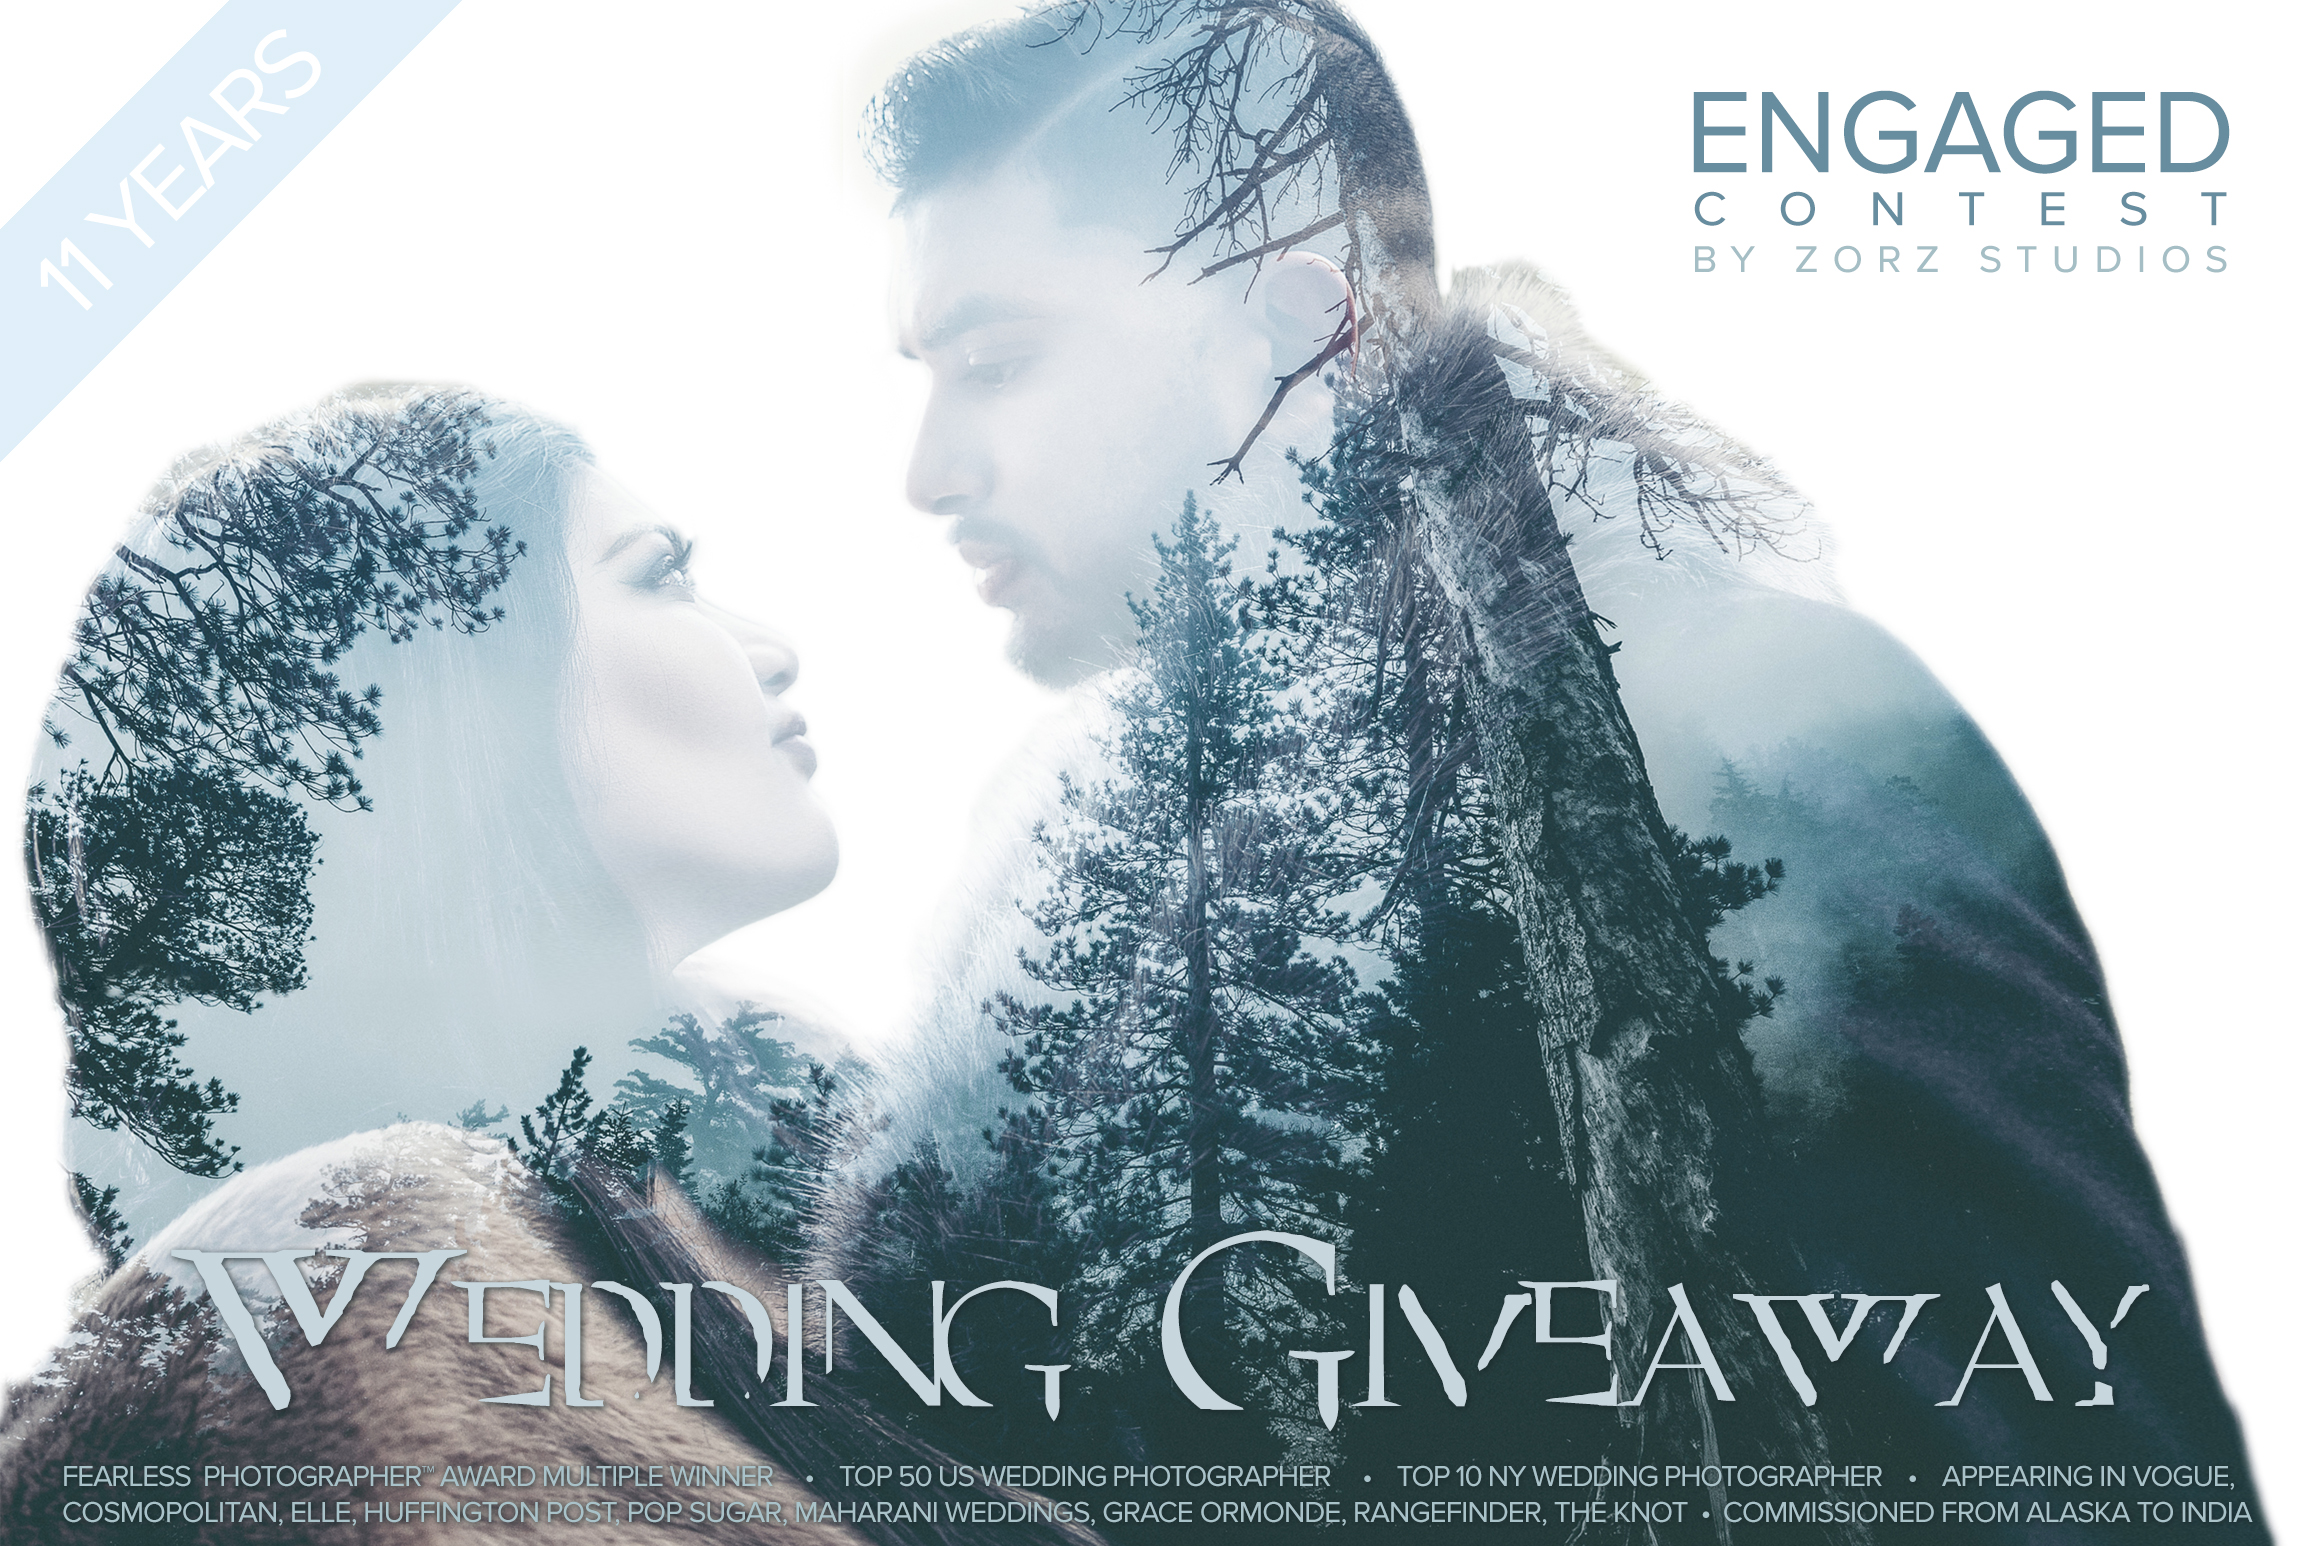 Wedding Giveaway: EngagEd 2020